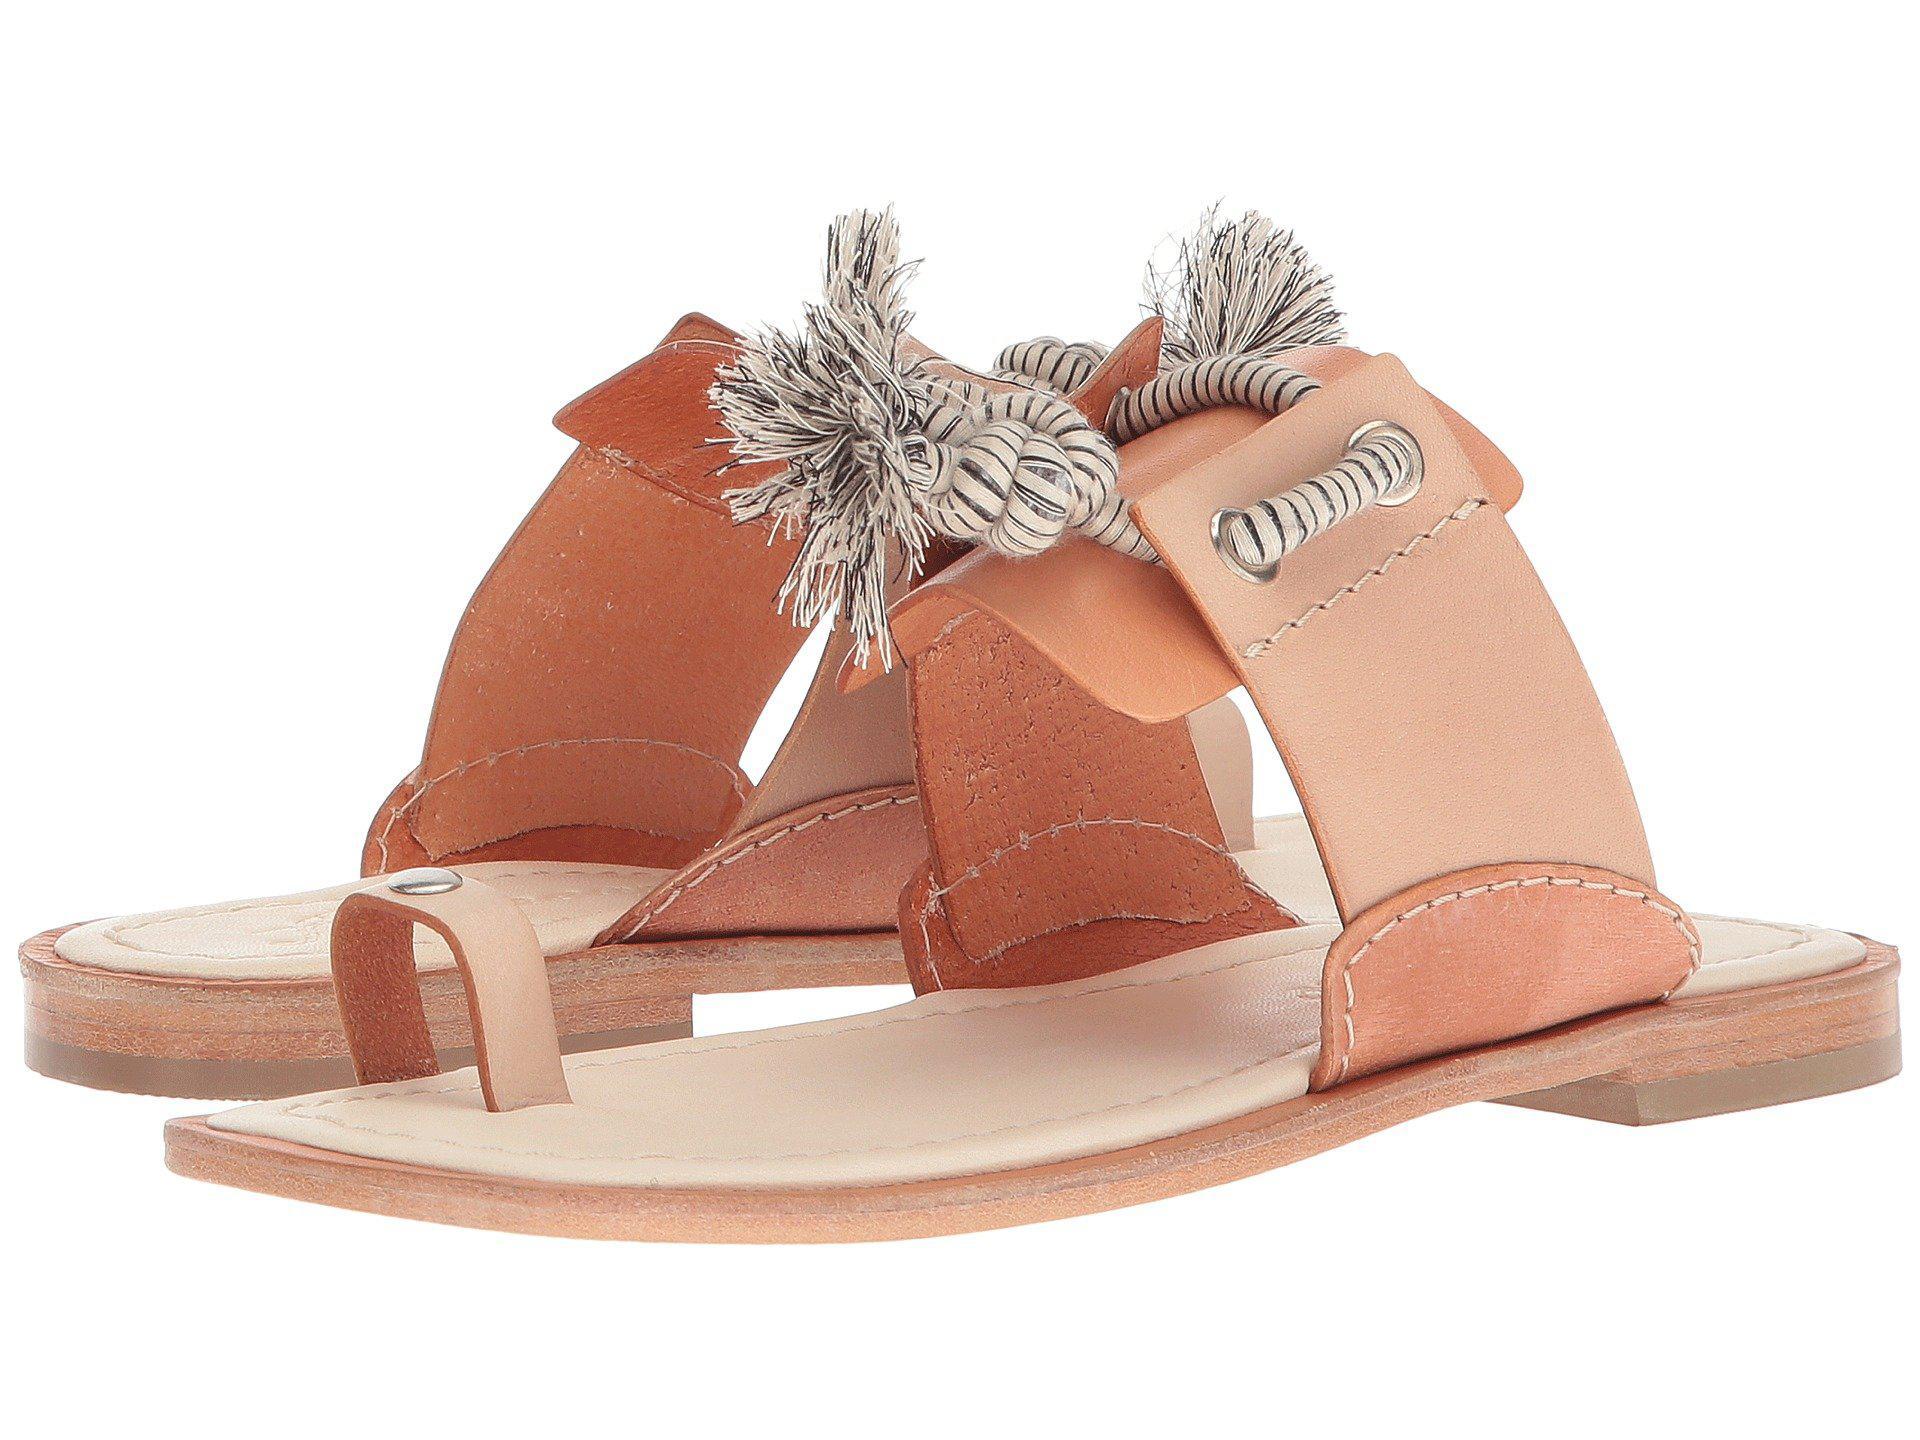 Free People Women's Crete Slide Sandal Go3U1pBzG